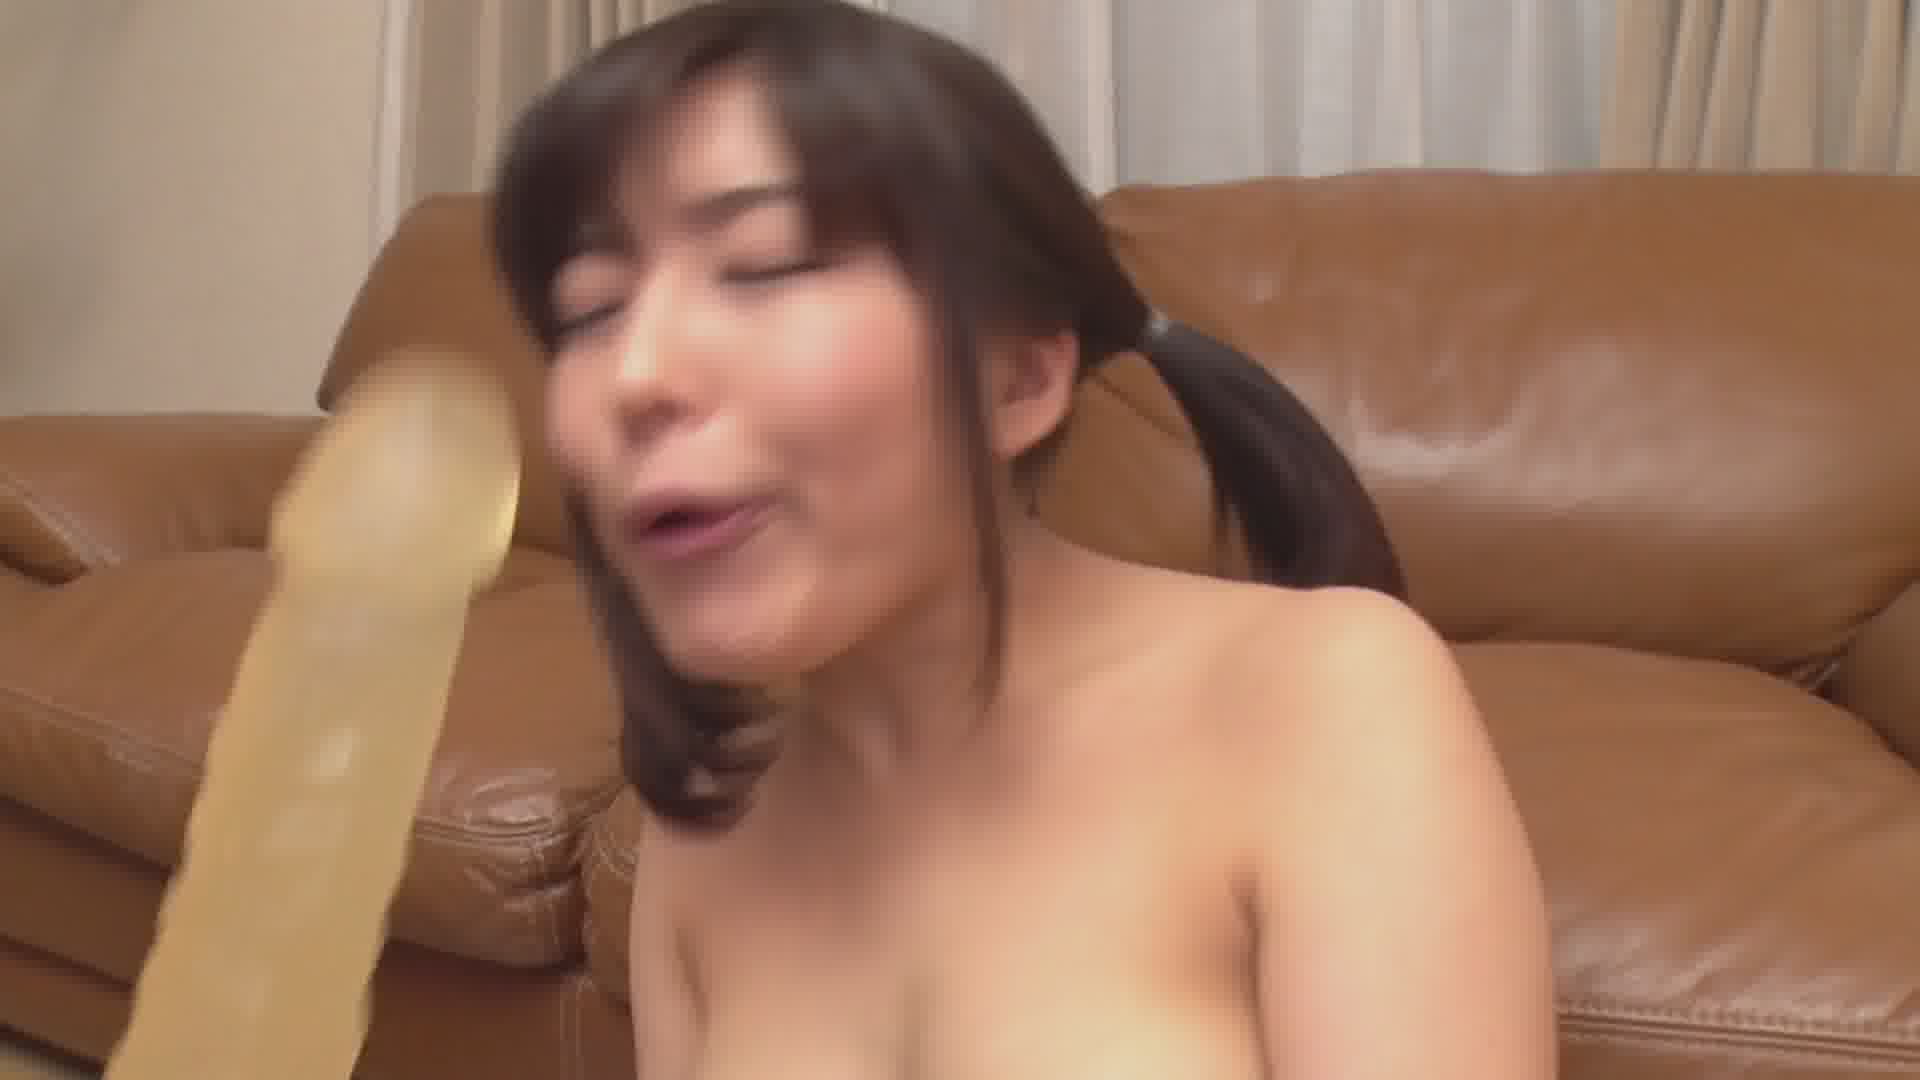 THE 未公開 ~喉オナホ5~ - 夏目なな【美乳・口内発射・イラマチオ】